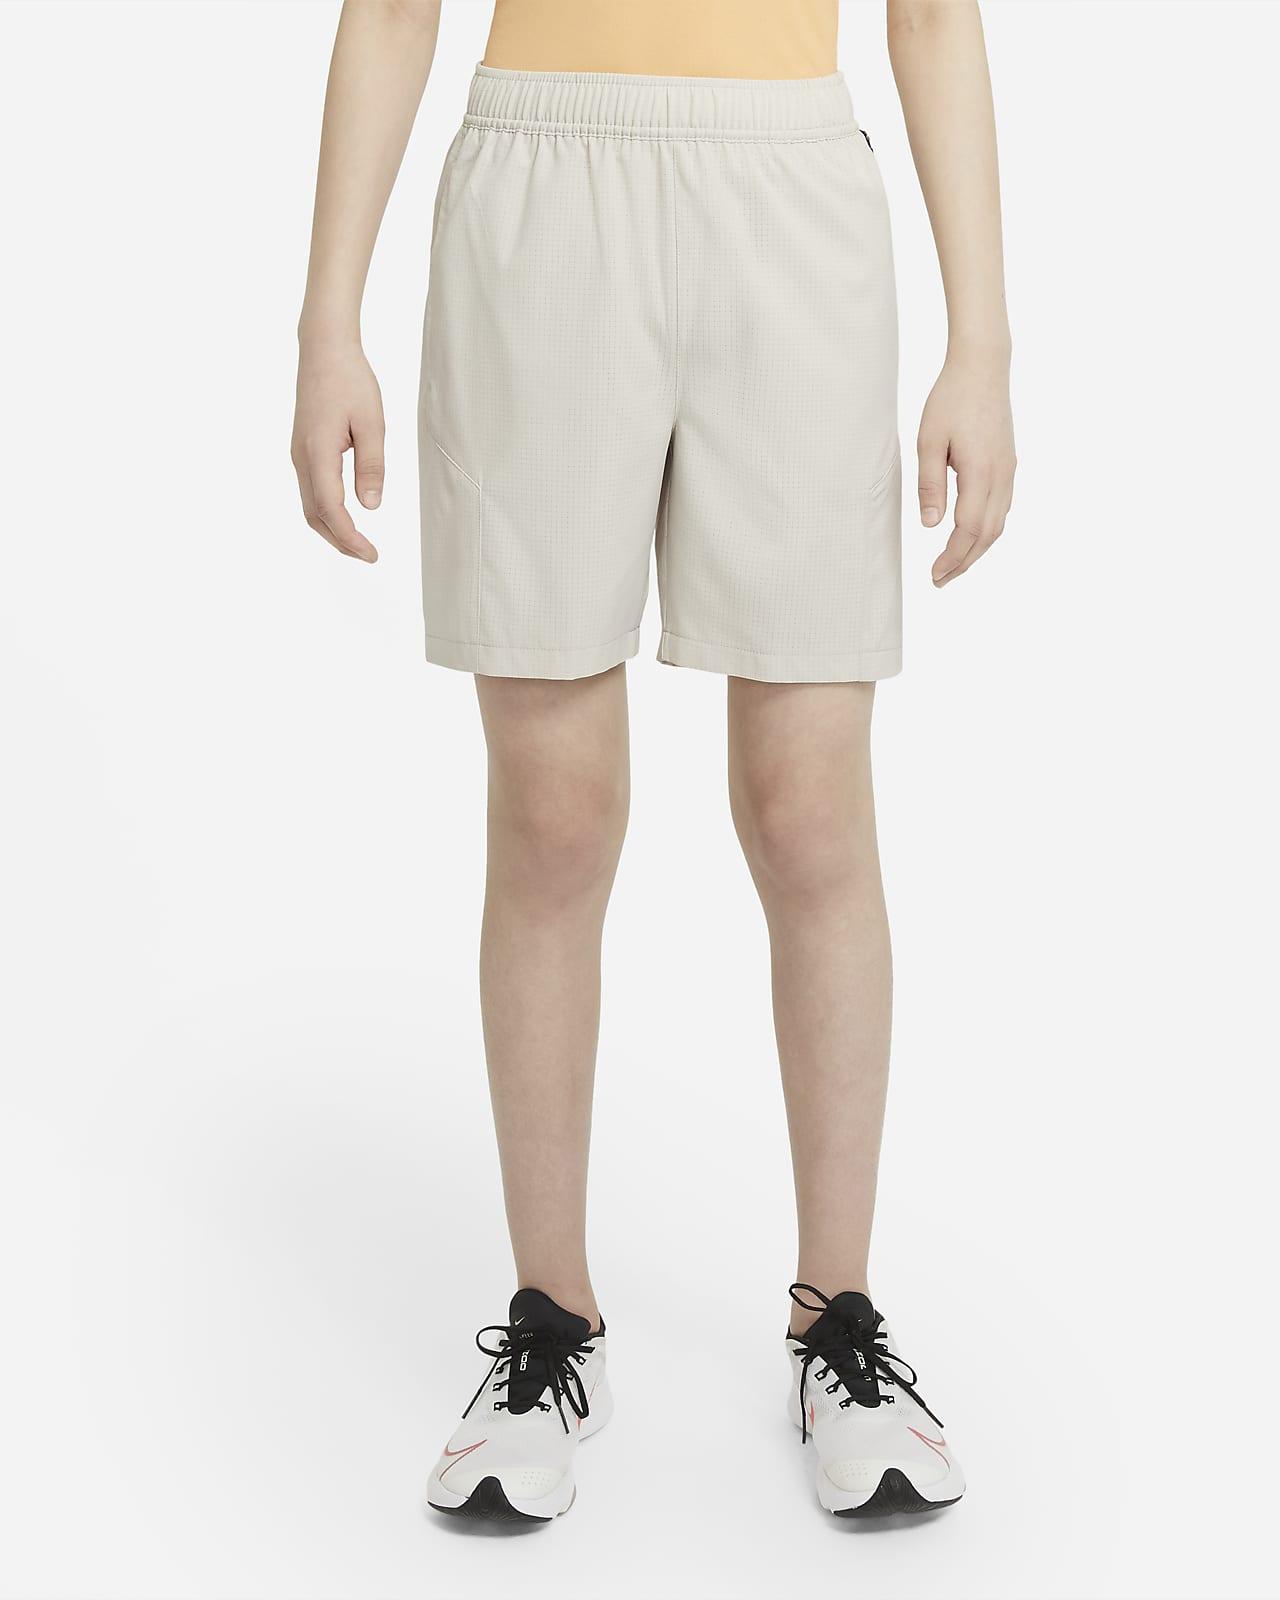 Nike Get Outside Older Kids' (Boys') Woven Training Shorts